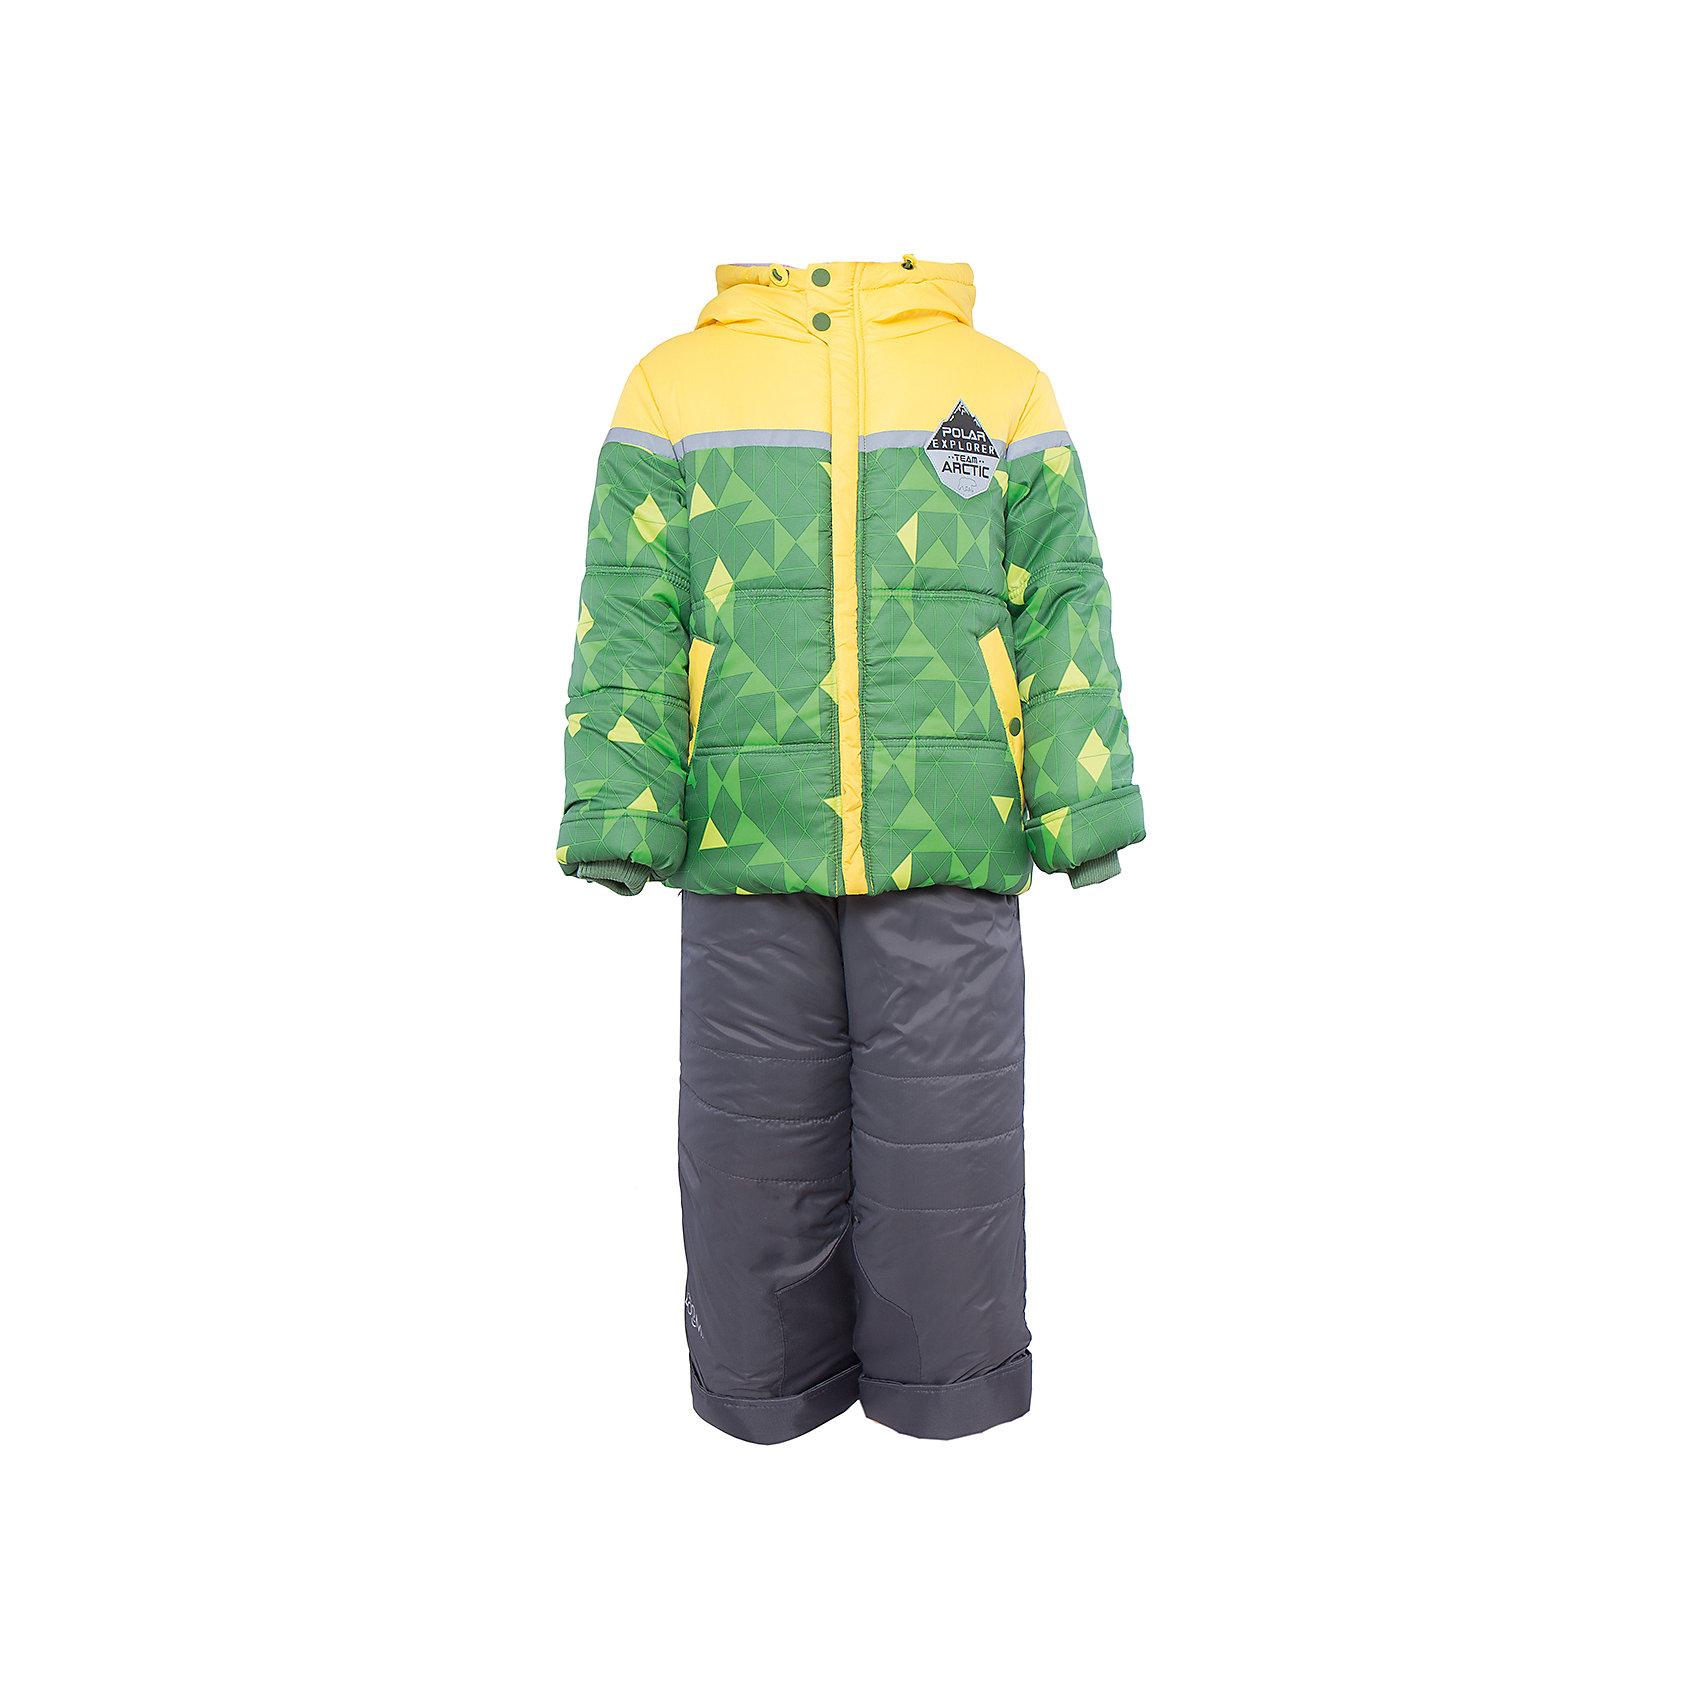 BOOM by Orby Комплект: курта и брюки для мальчика BOOM by Orby boom by orby boom by orby пальто зимнее 400гр пудровый принт